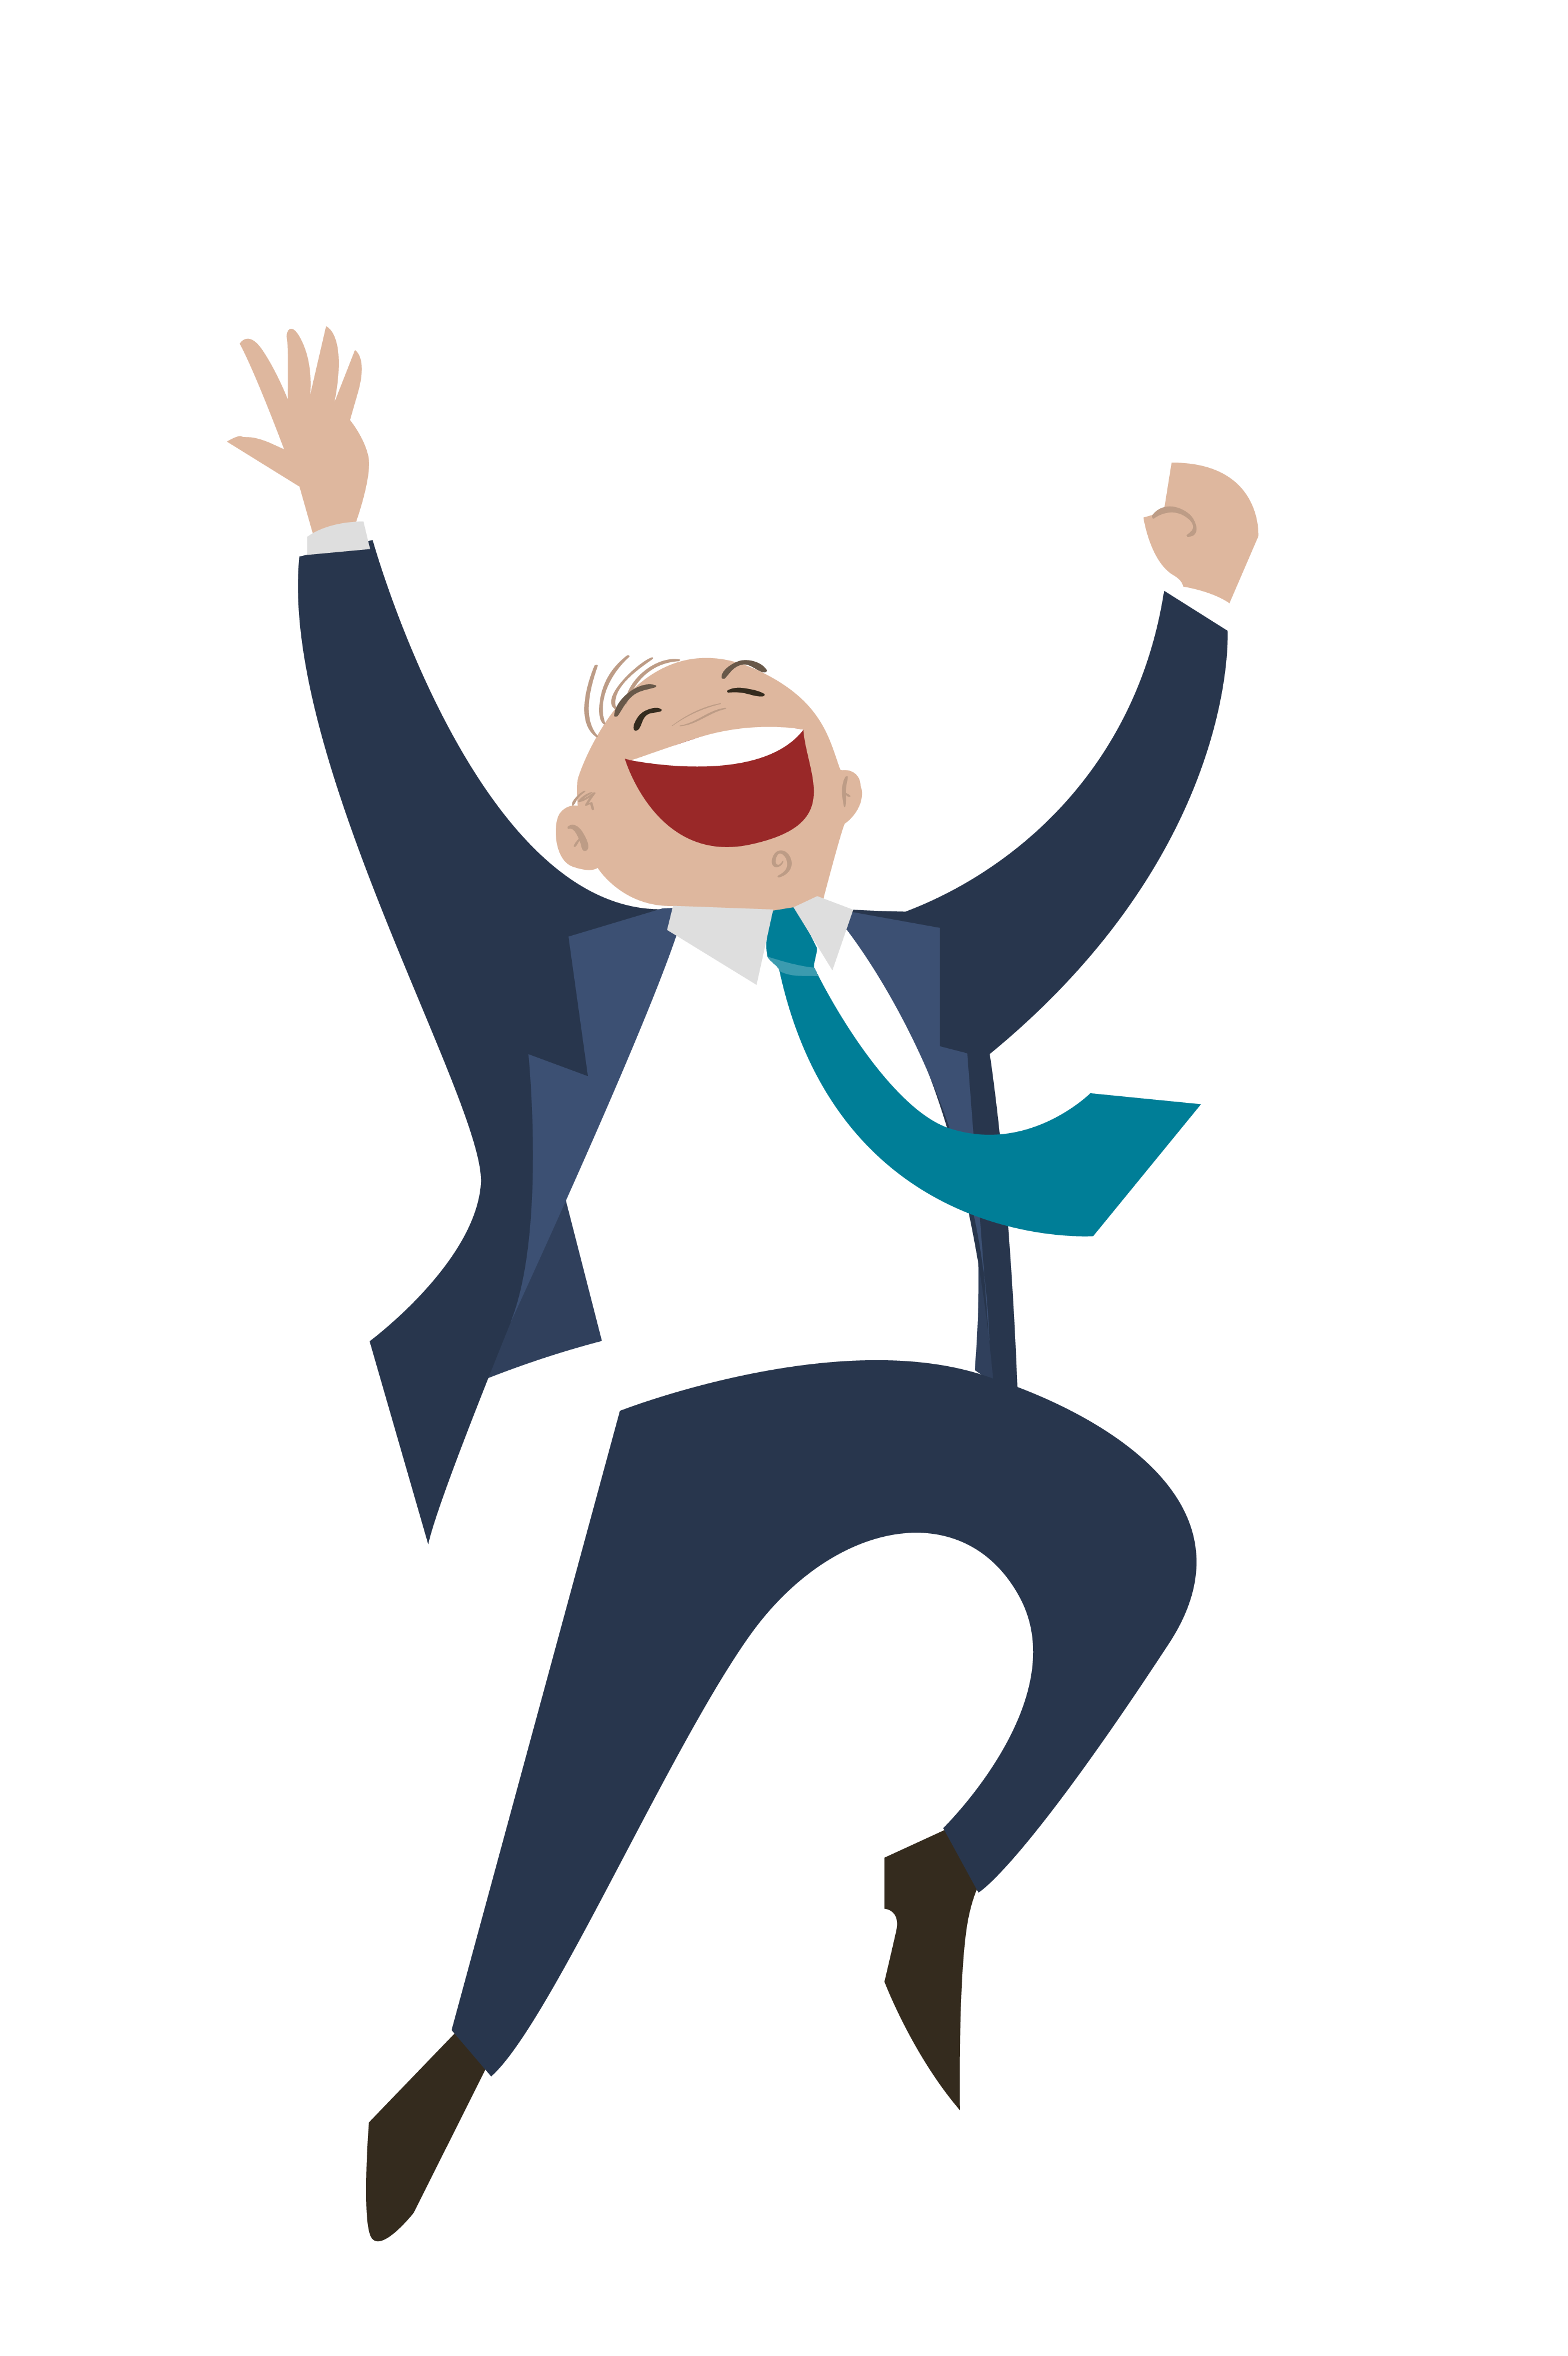 Jump clipart happy man. Business entrepreneurship startup company